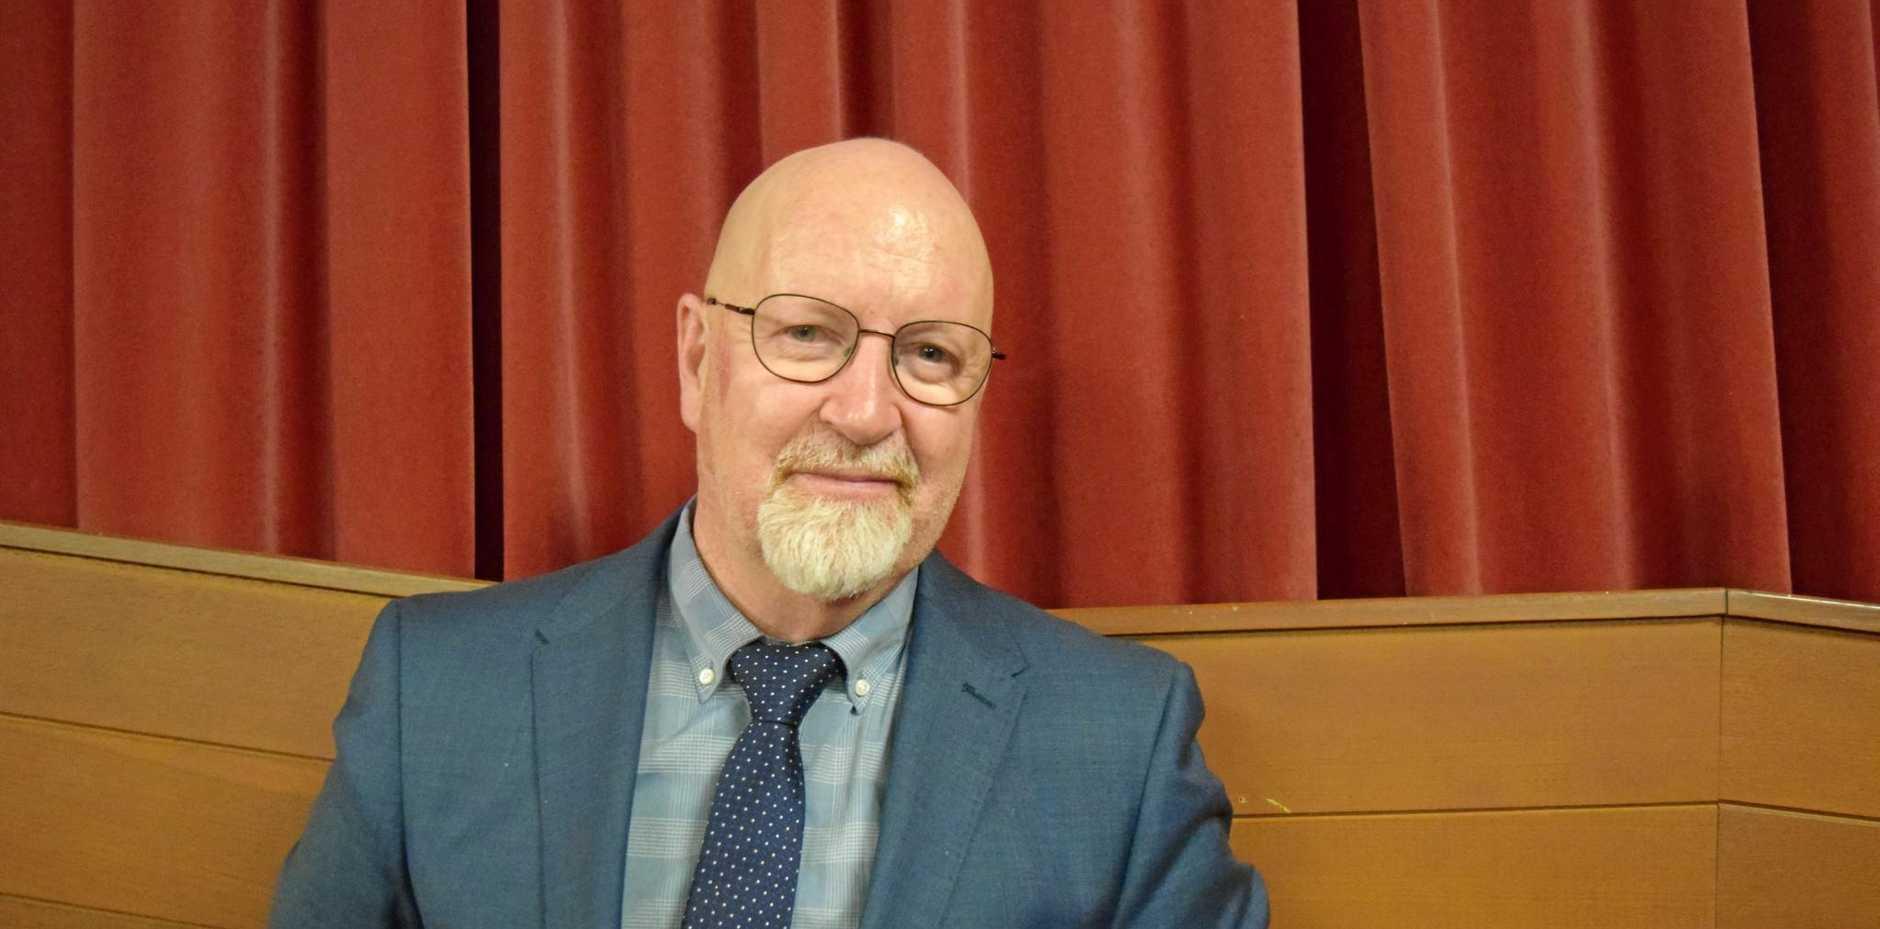 STEMMING THE TIDE: Ex-Bundaberg psychologist Dr Brian Sullivan believes violent men need rehabilitating to stop family violence.